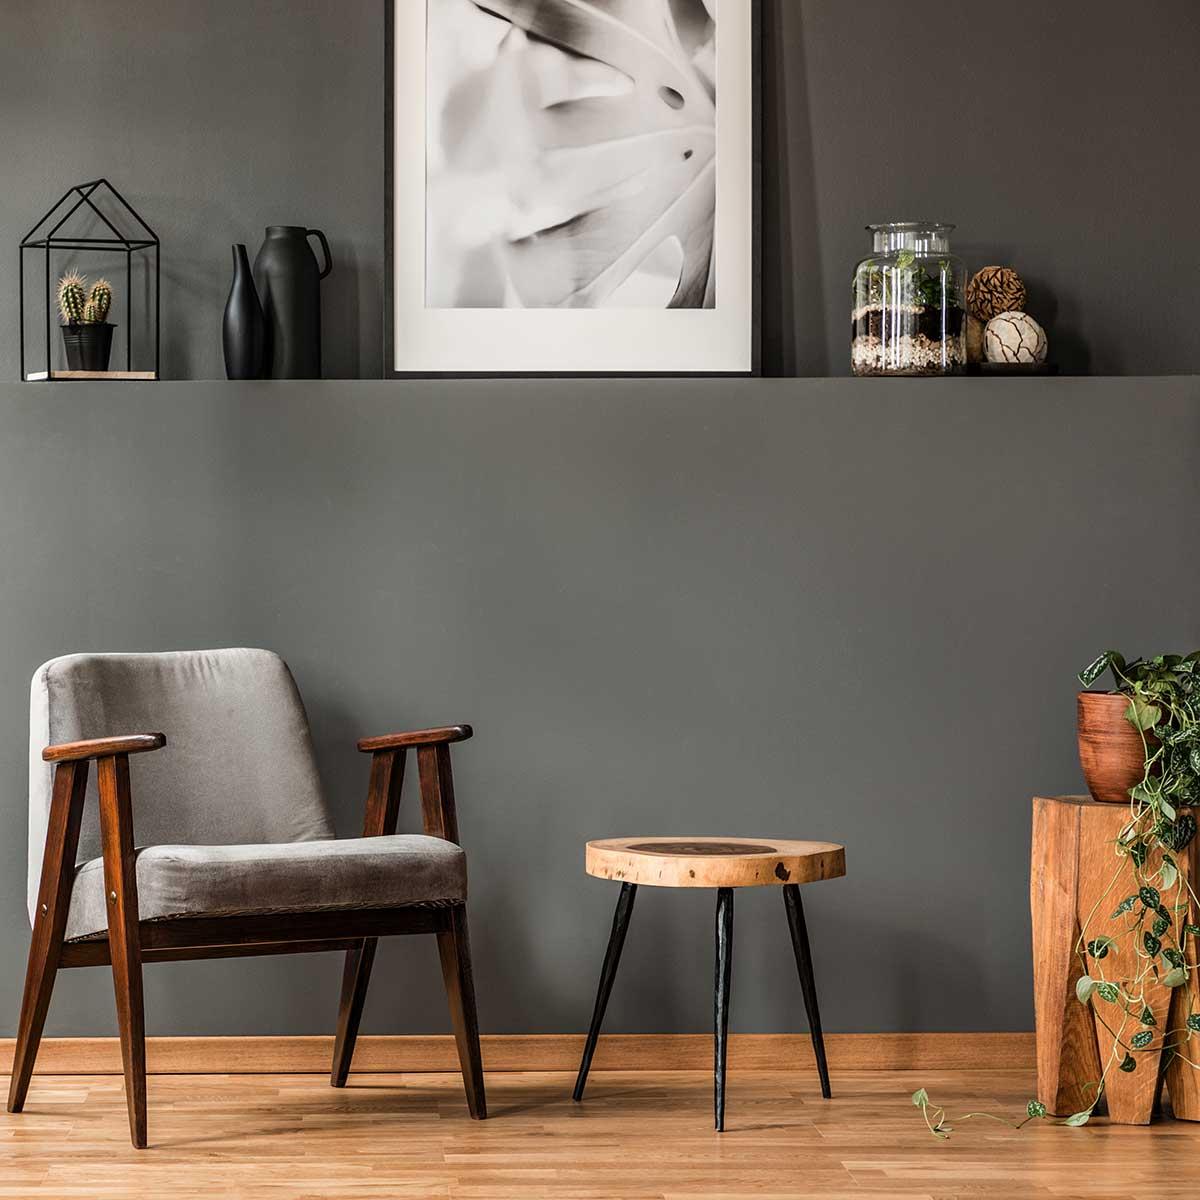 Gelakte houten vloer met interieur